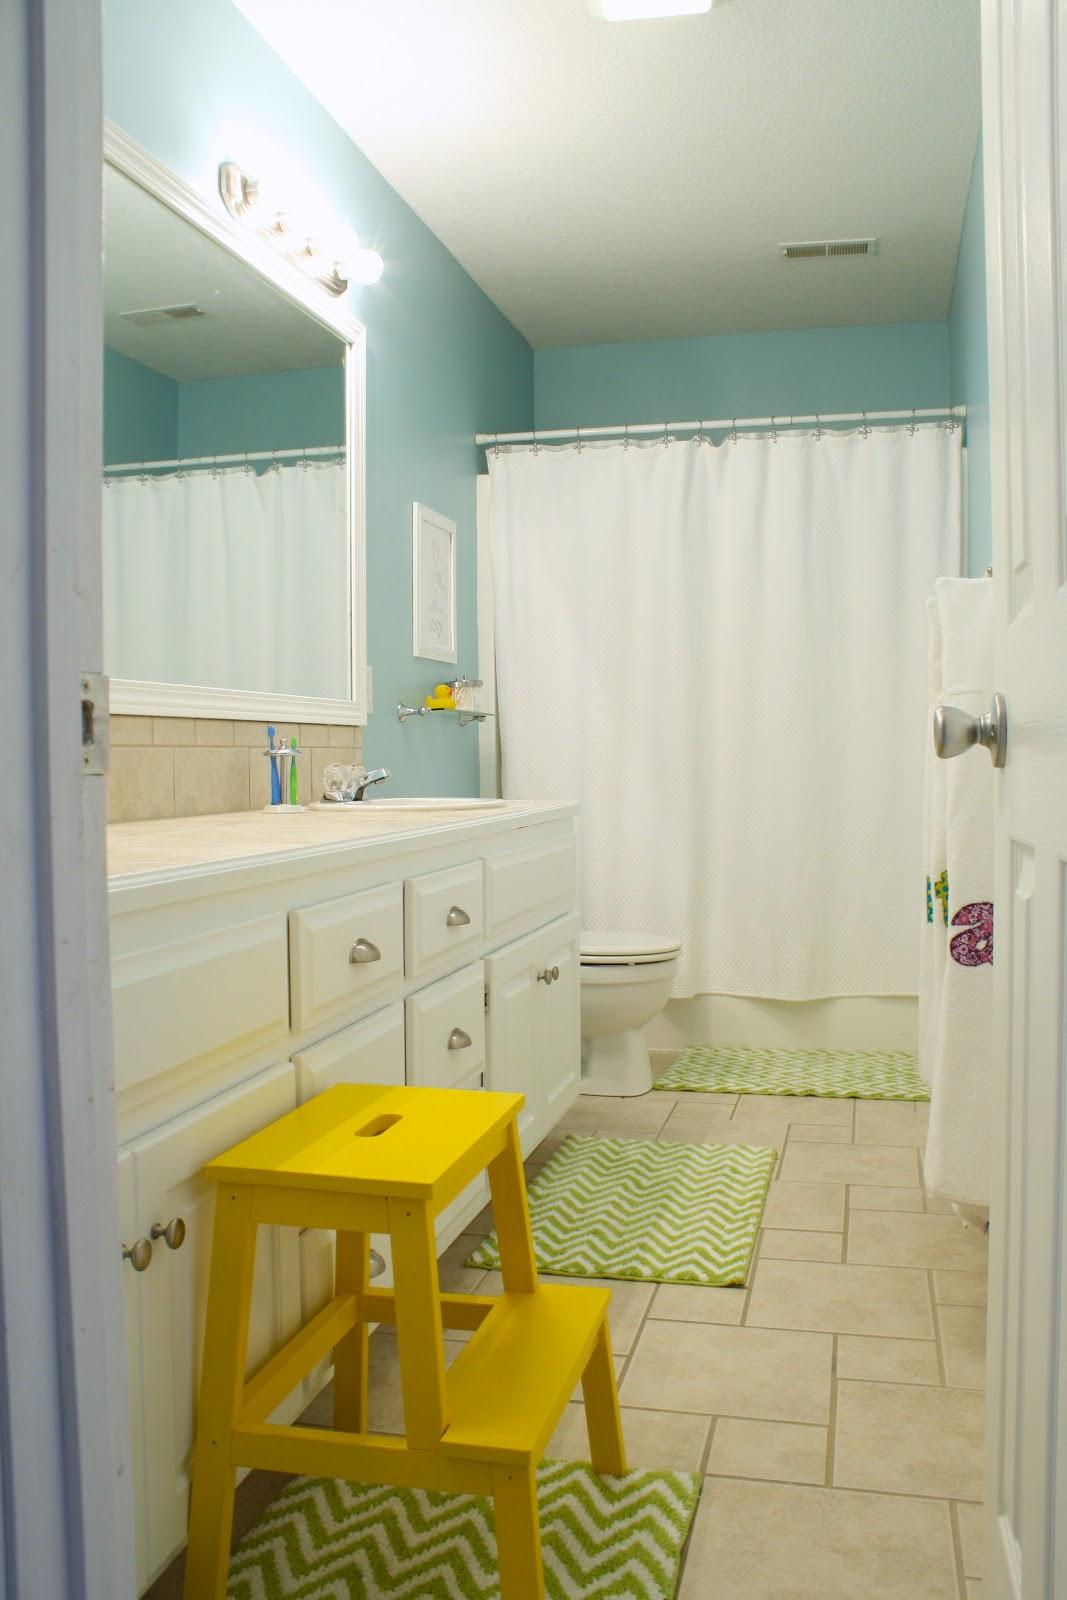 97+ Dream Bathroom For Kids - Browse Our Beautiful Bathroom Designs ...